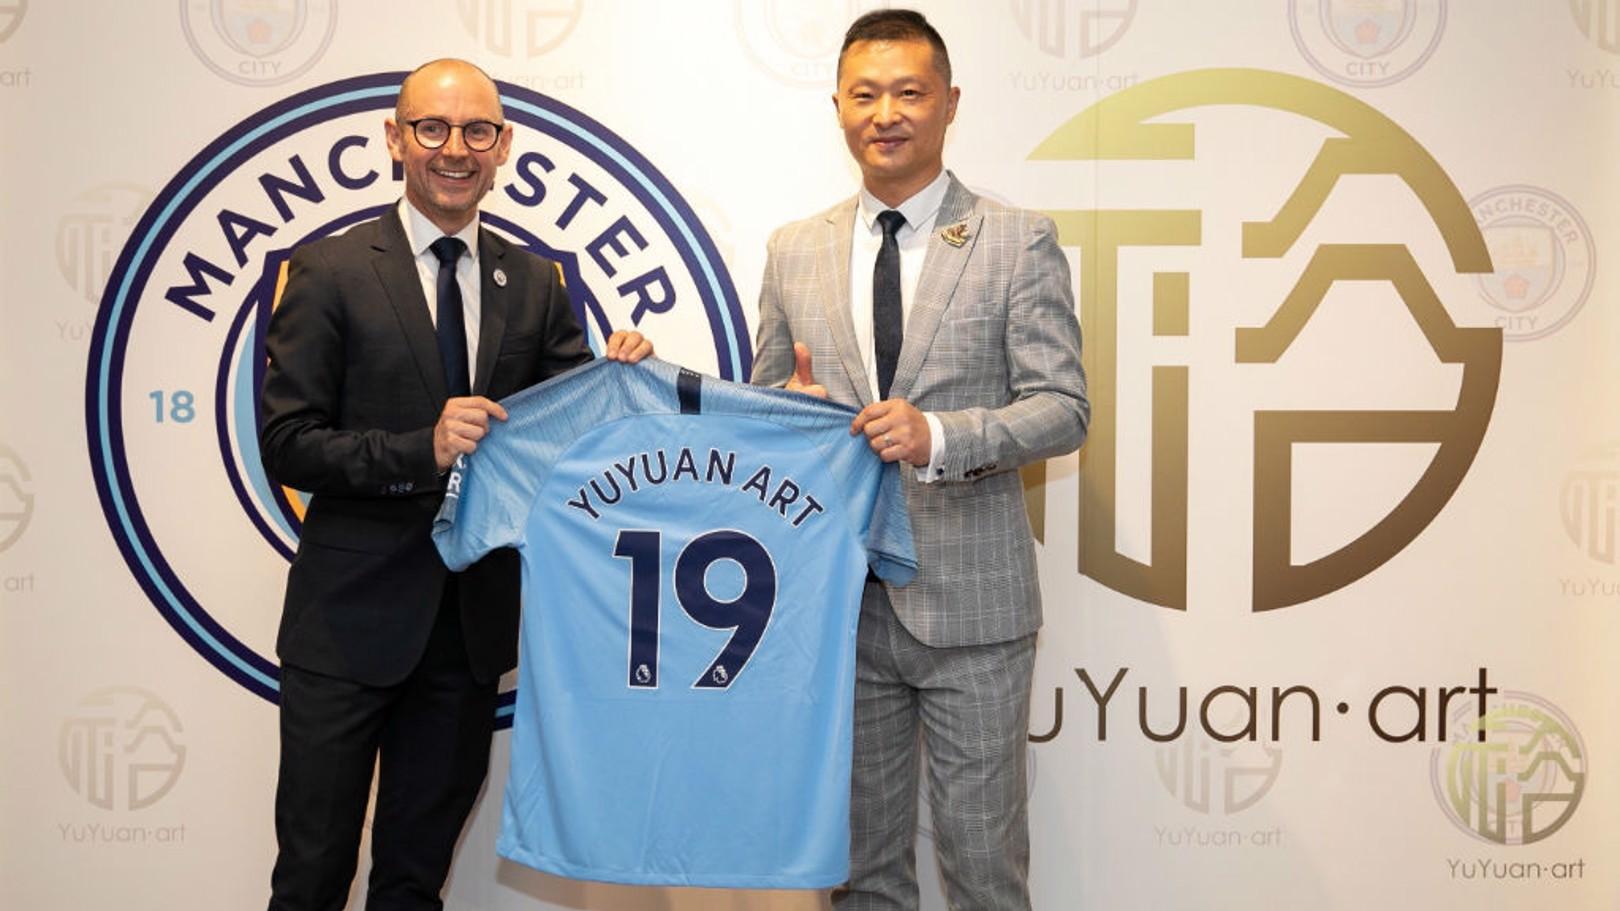 City announces YuYuan Art partnership